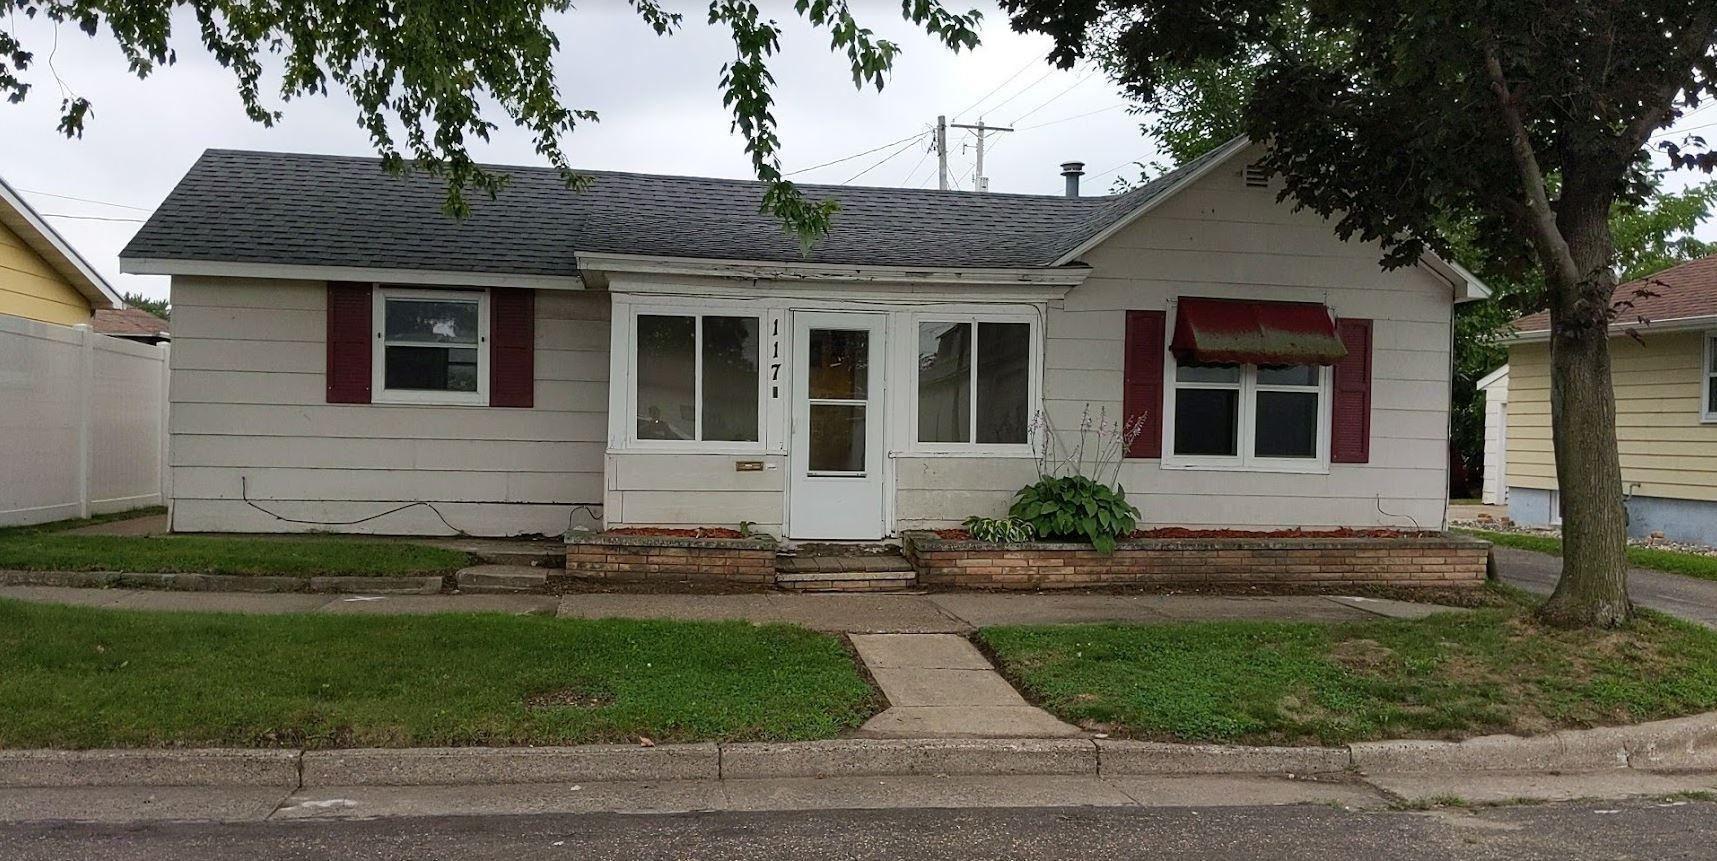 117 Chestnut Street, Winona, MN 55987 - MLS#: 6090351